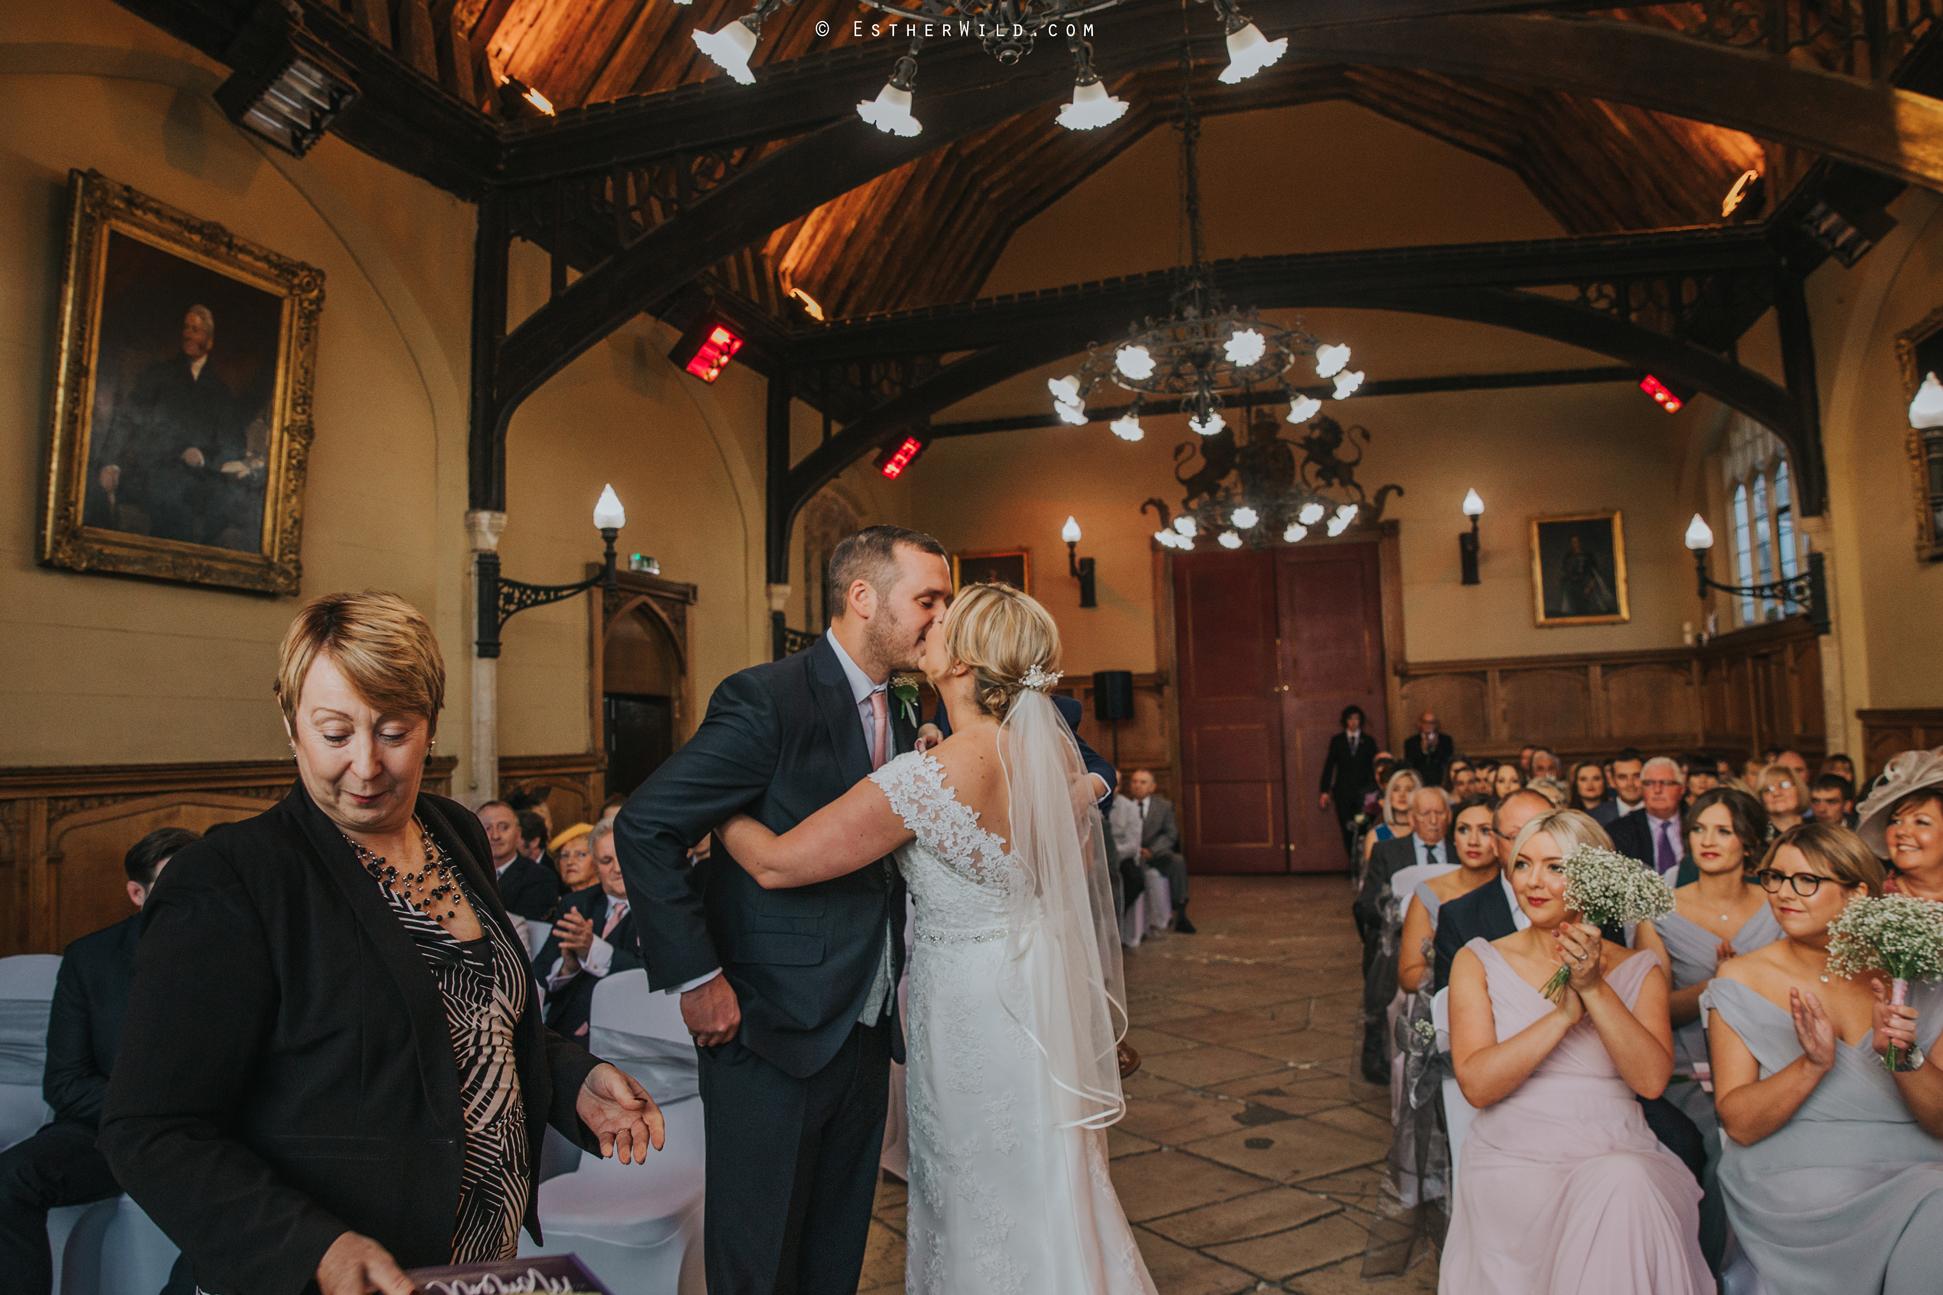 Wedding_Kings_Lynn_Town_Hall_Norfolk_Photographer_Esther_Wild_IMG_1044.jpg